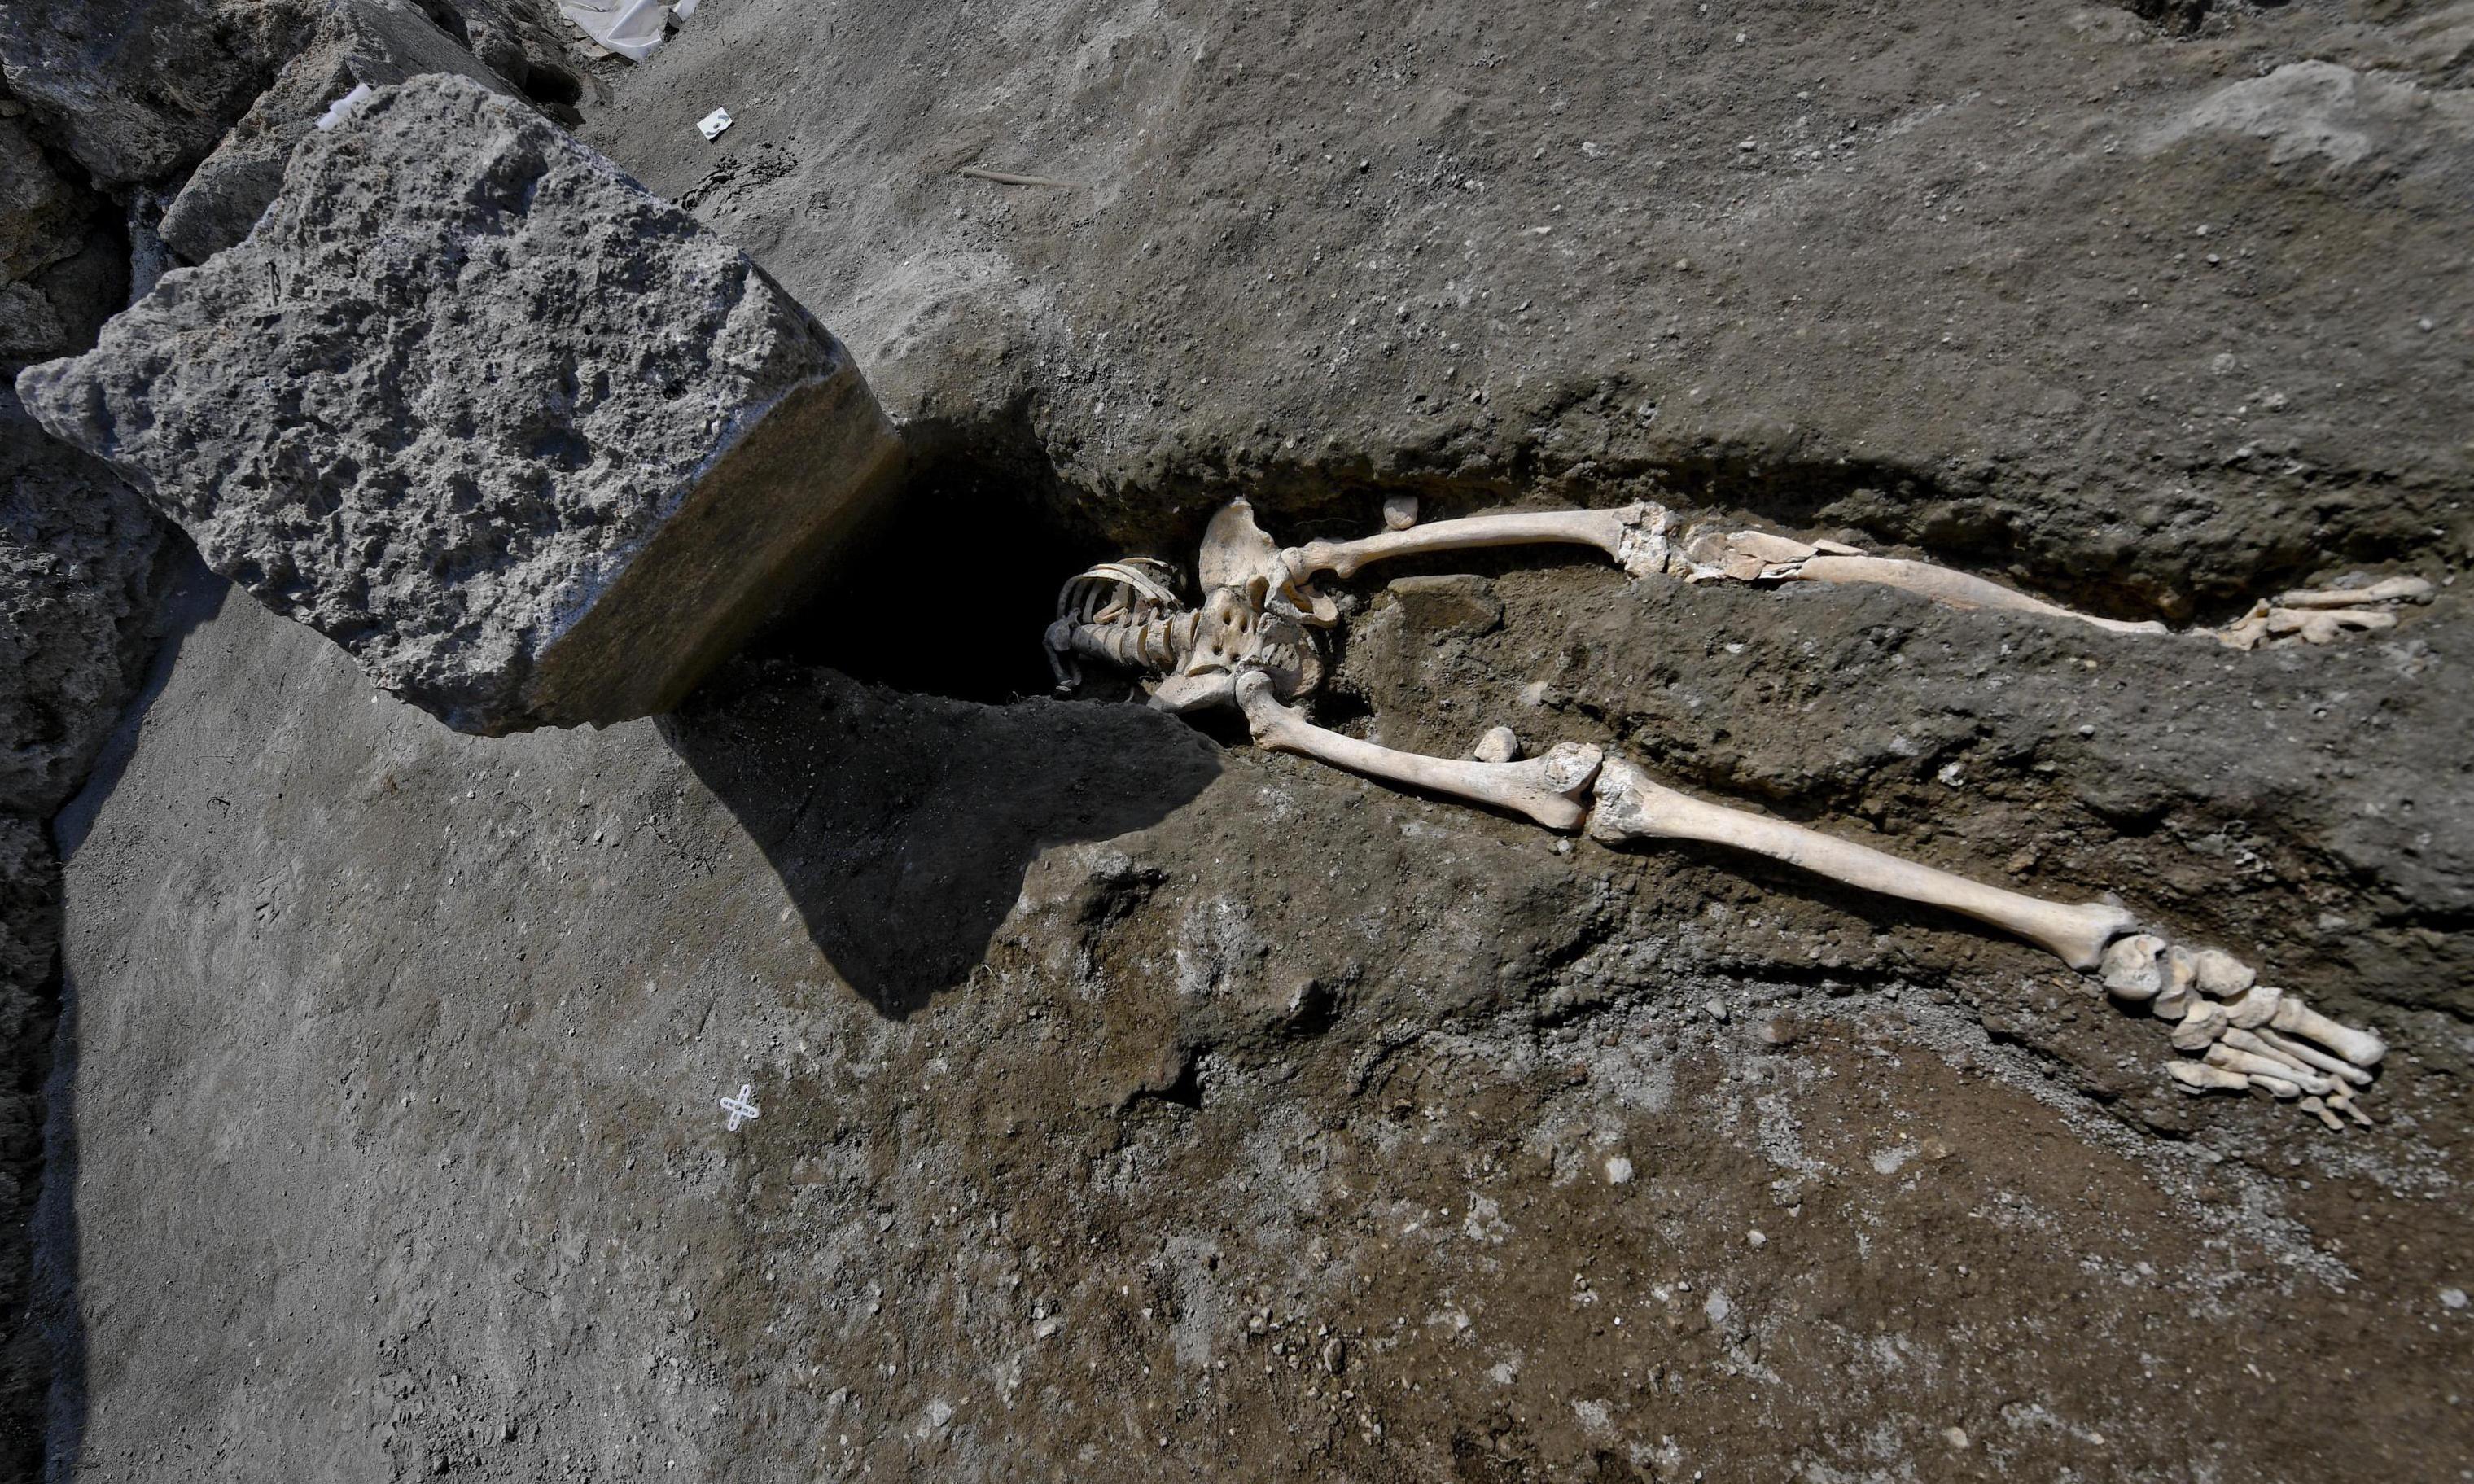 Skeleton unearthed of man crushed by huge rock in Vesuvius eruption